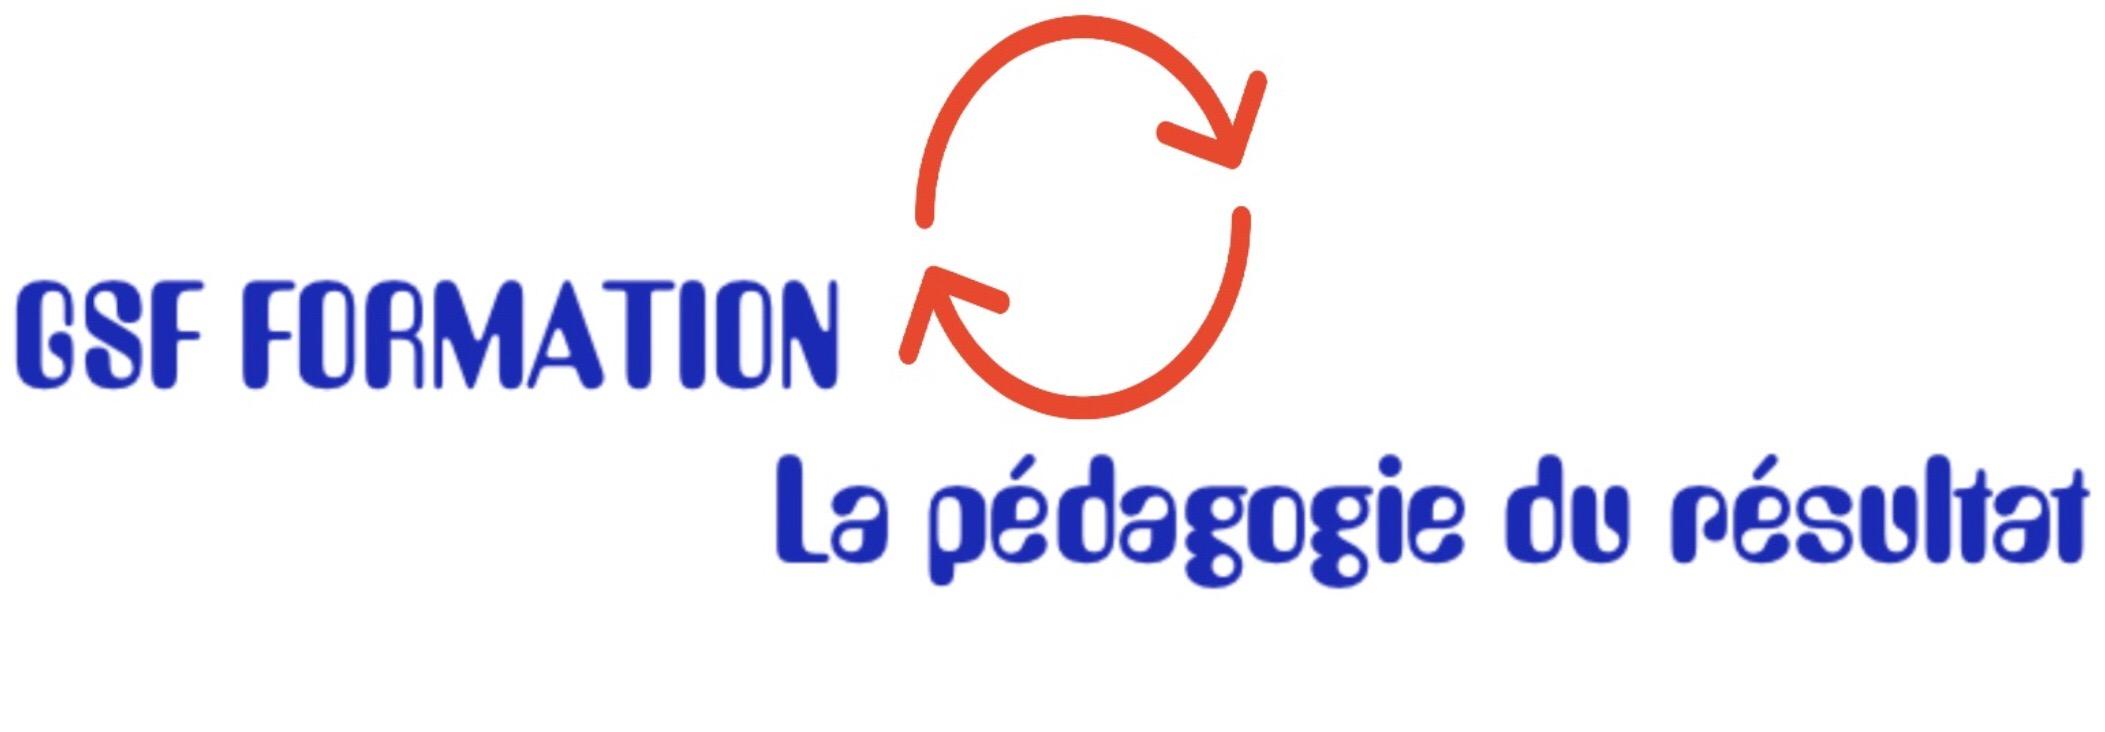 Logo GSF FORMATION